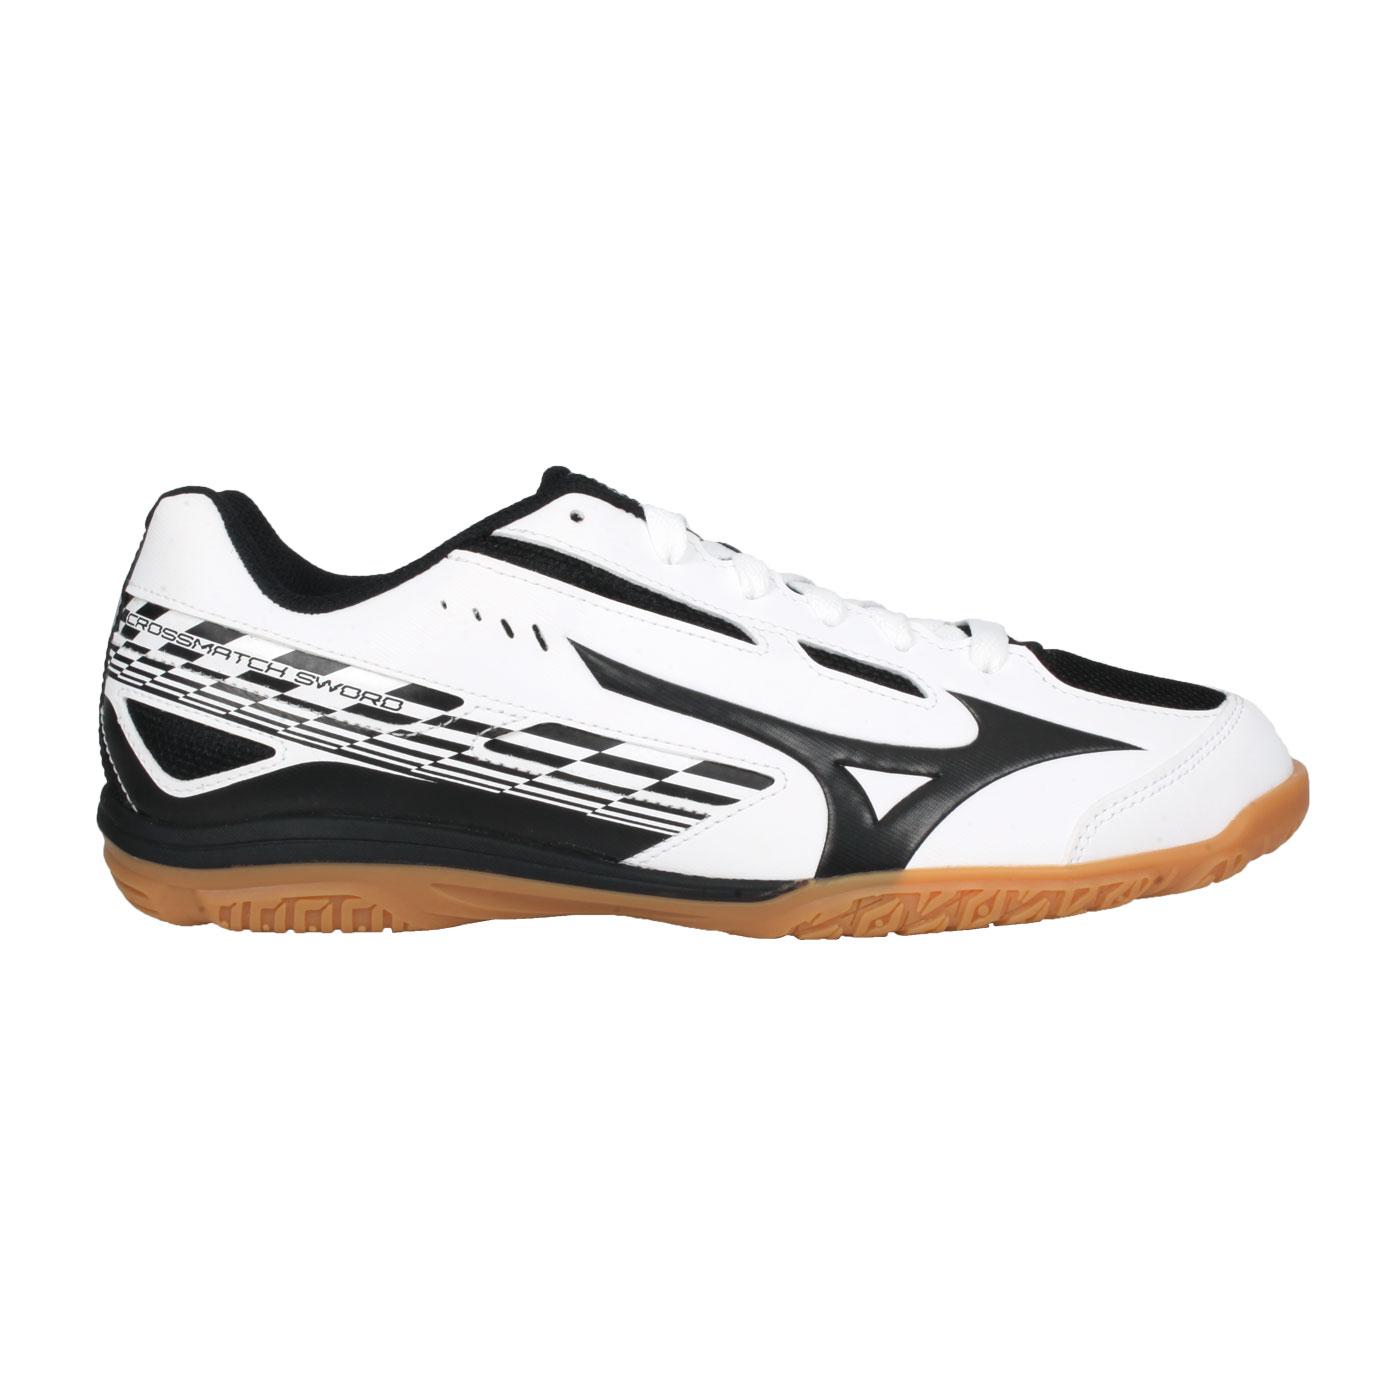 MIZUNO 男款桌球鞋   @CROSSMATCH SWORD@81GA213009 - 白黑